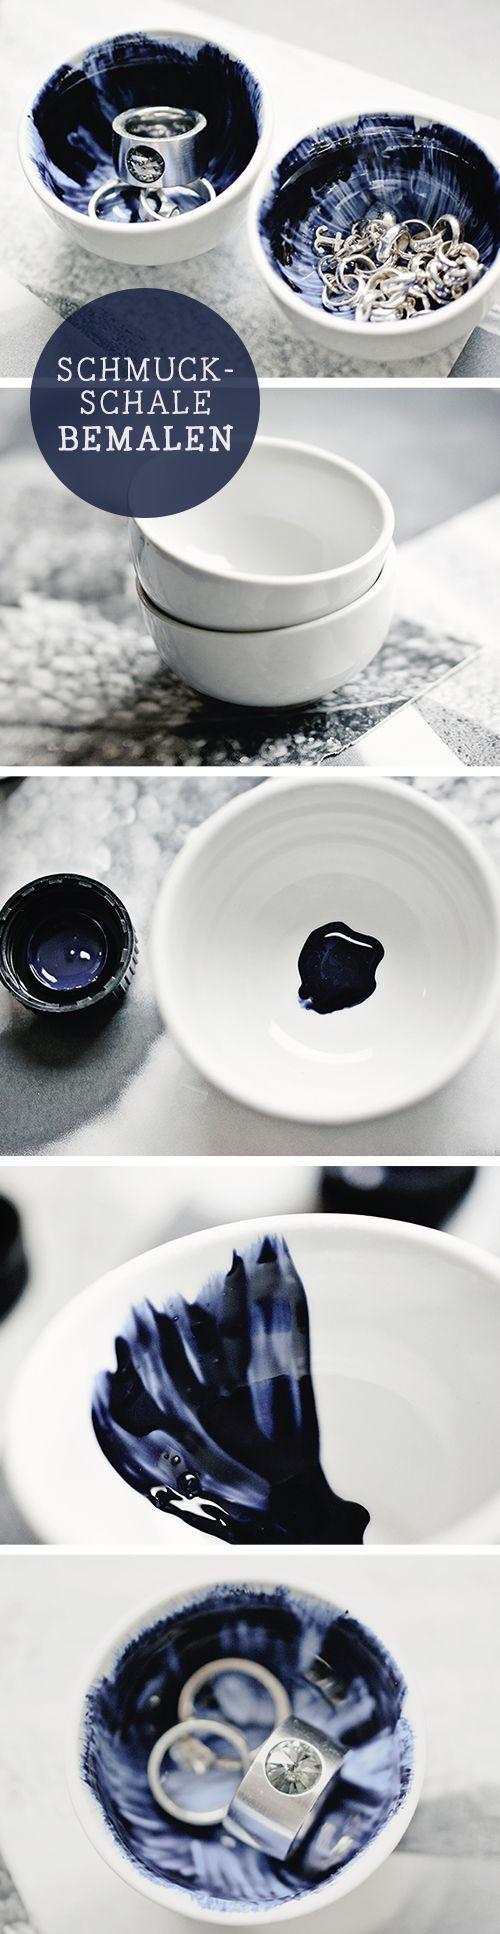 diy tutorial f r eine selbstgef rbte schmuckschale im shibori stil shibori styled jewellery. Black Bedroom Furniture Sets. Home Design Ideas